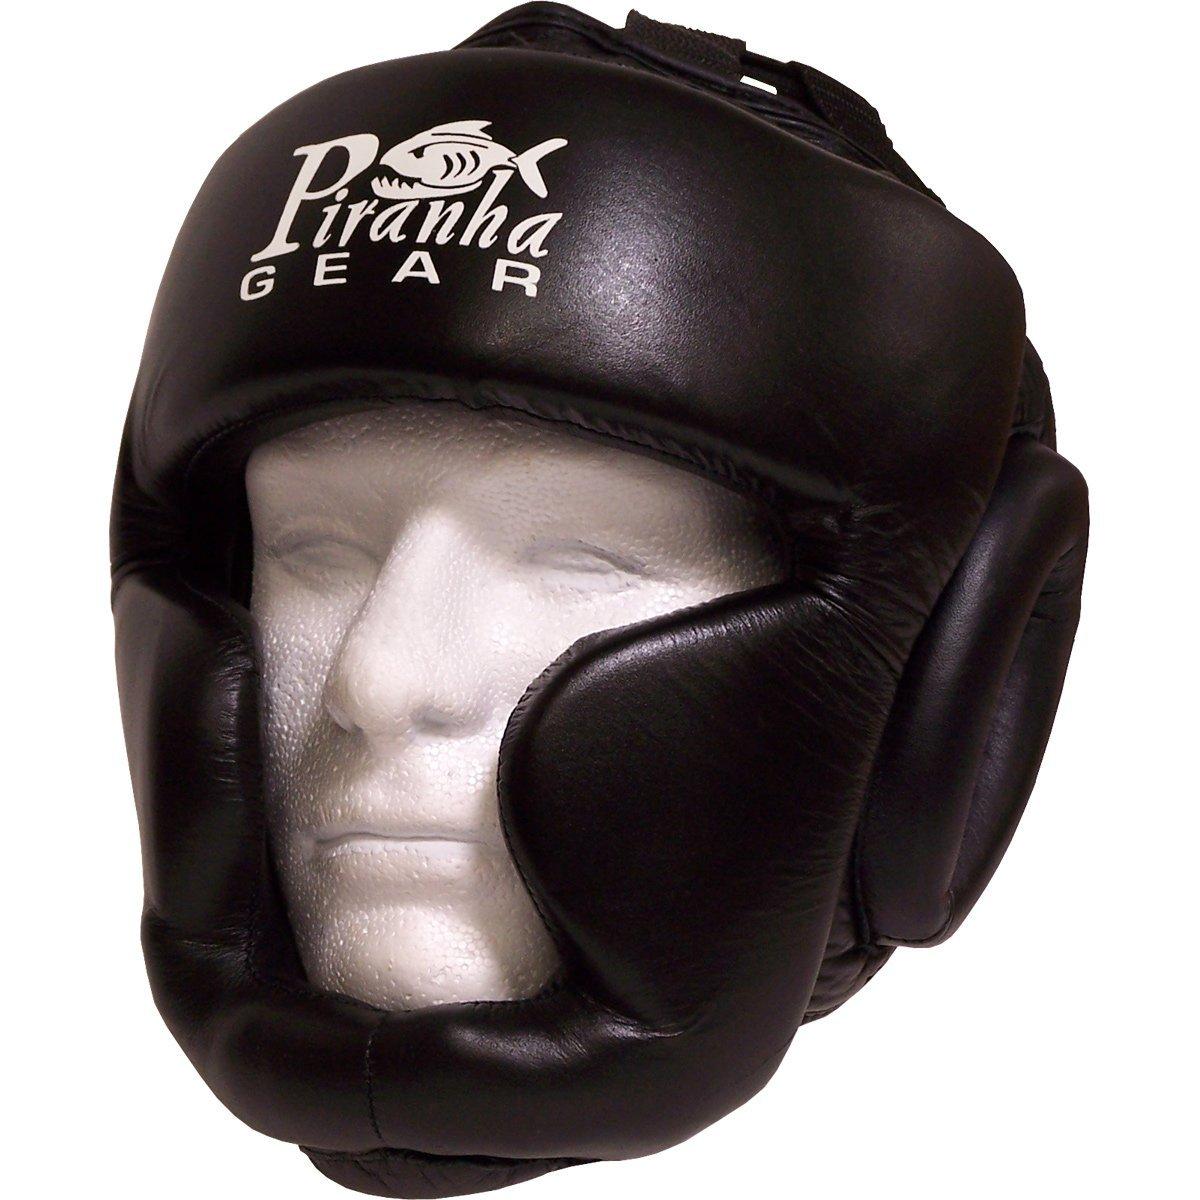 Piranha Gear Leather head guard w/ chin and cheek padding